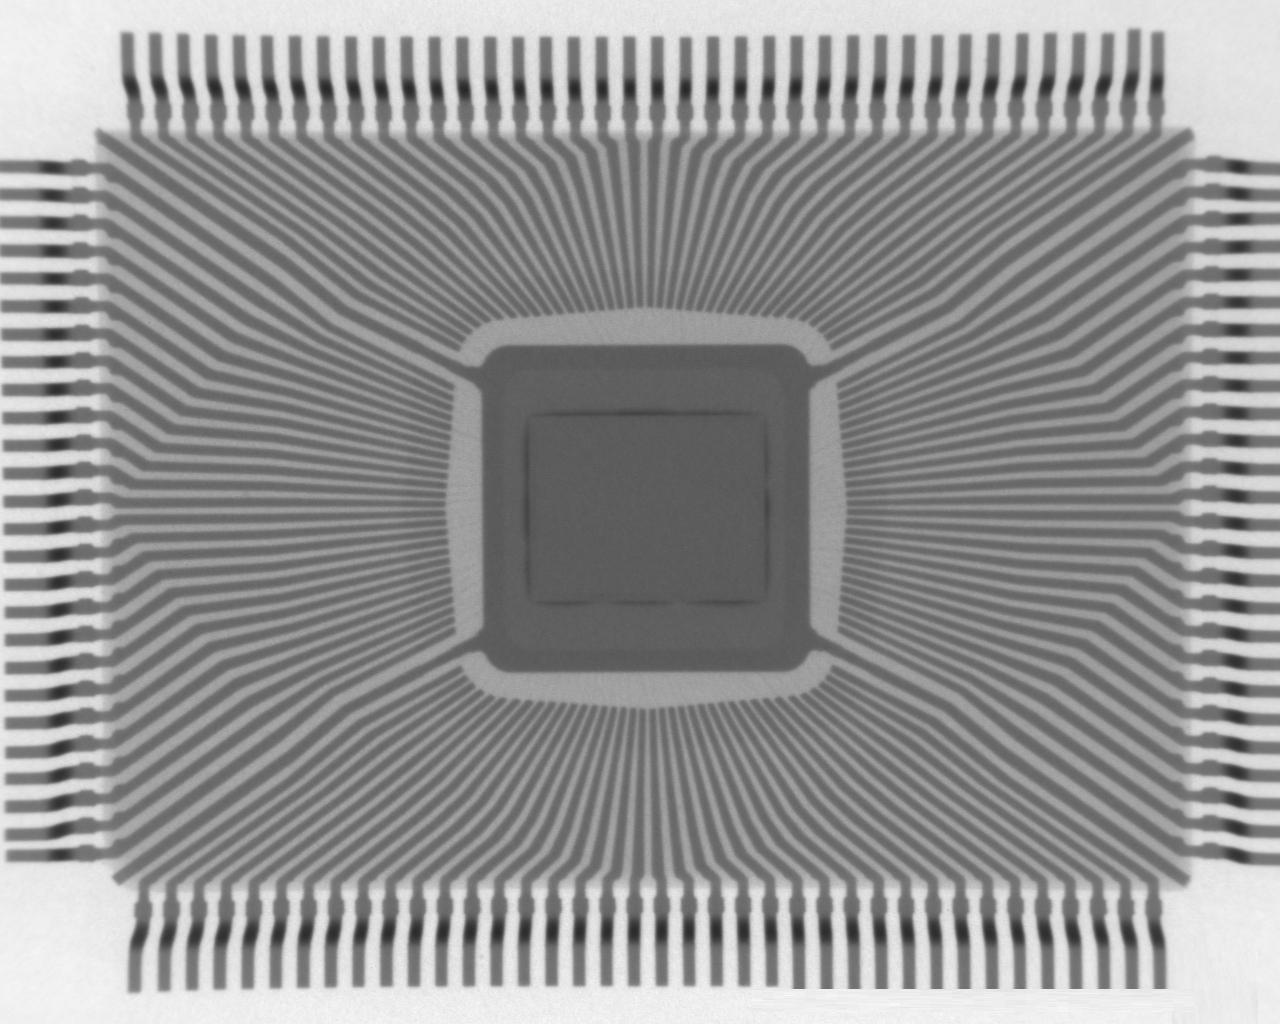 PQFP-128封装芯片在X-RAY下的景象